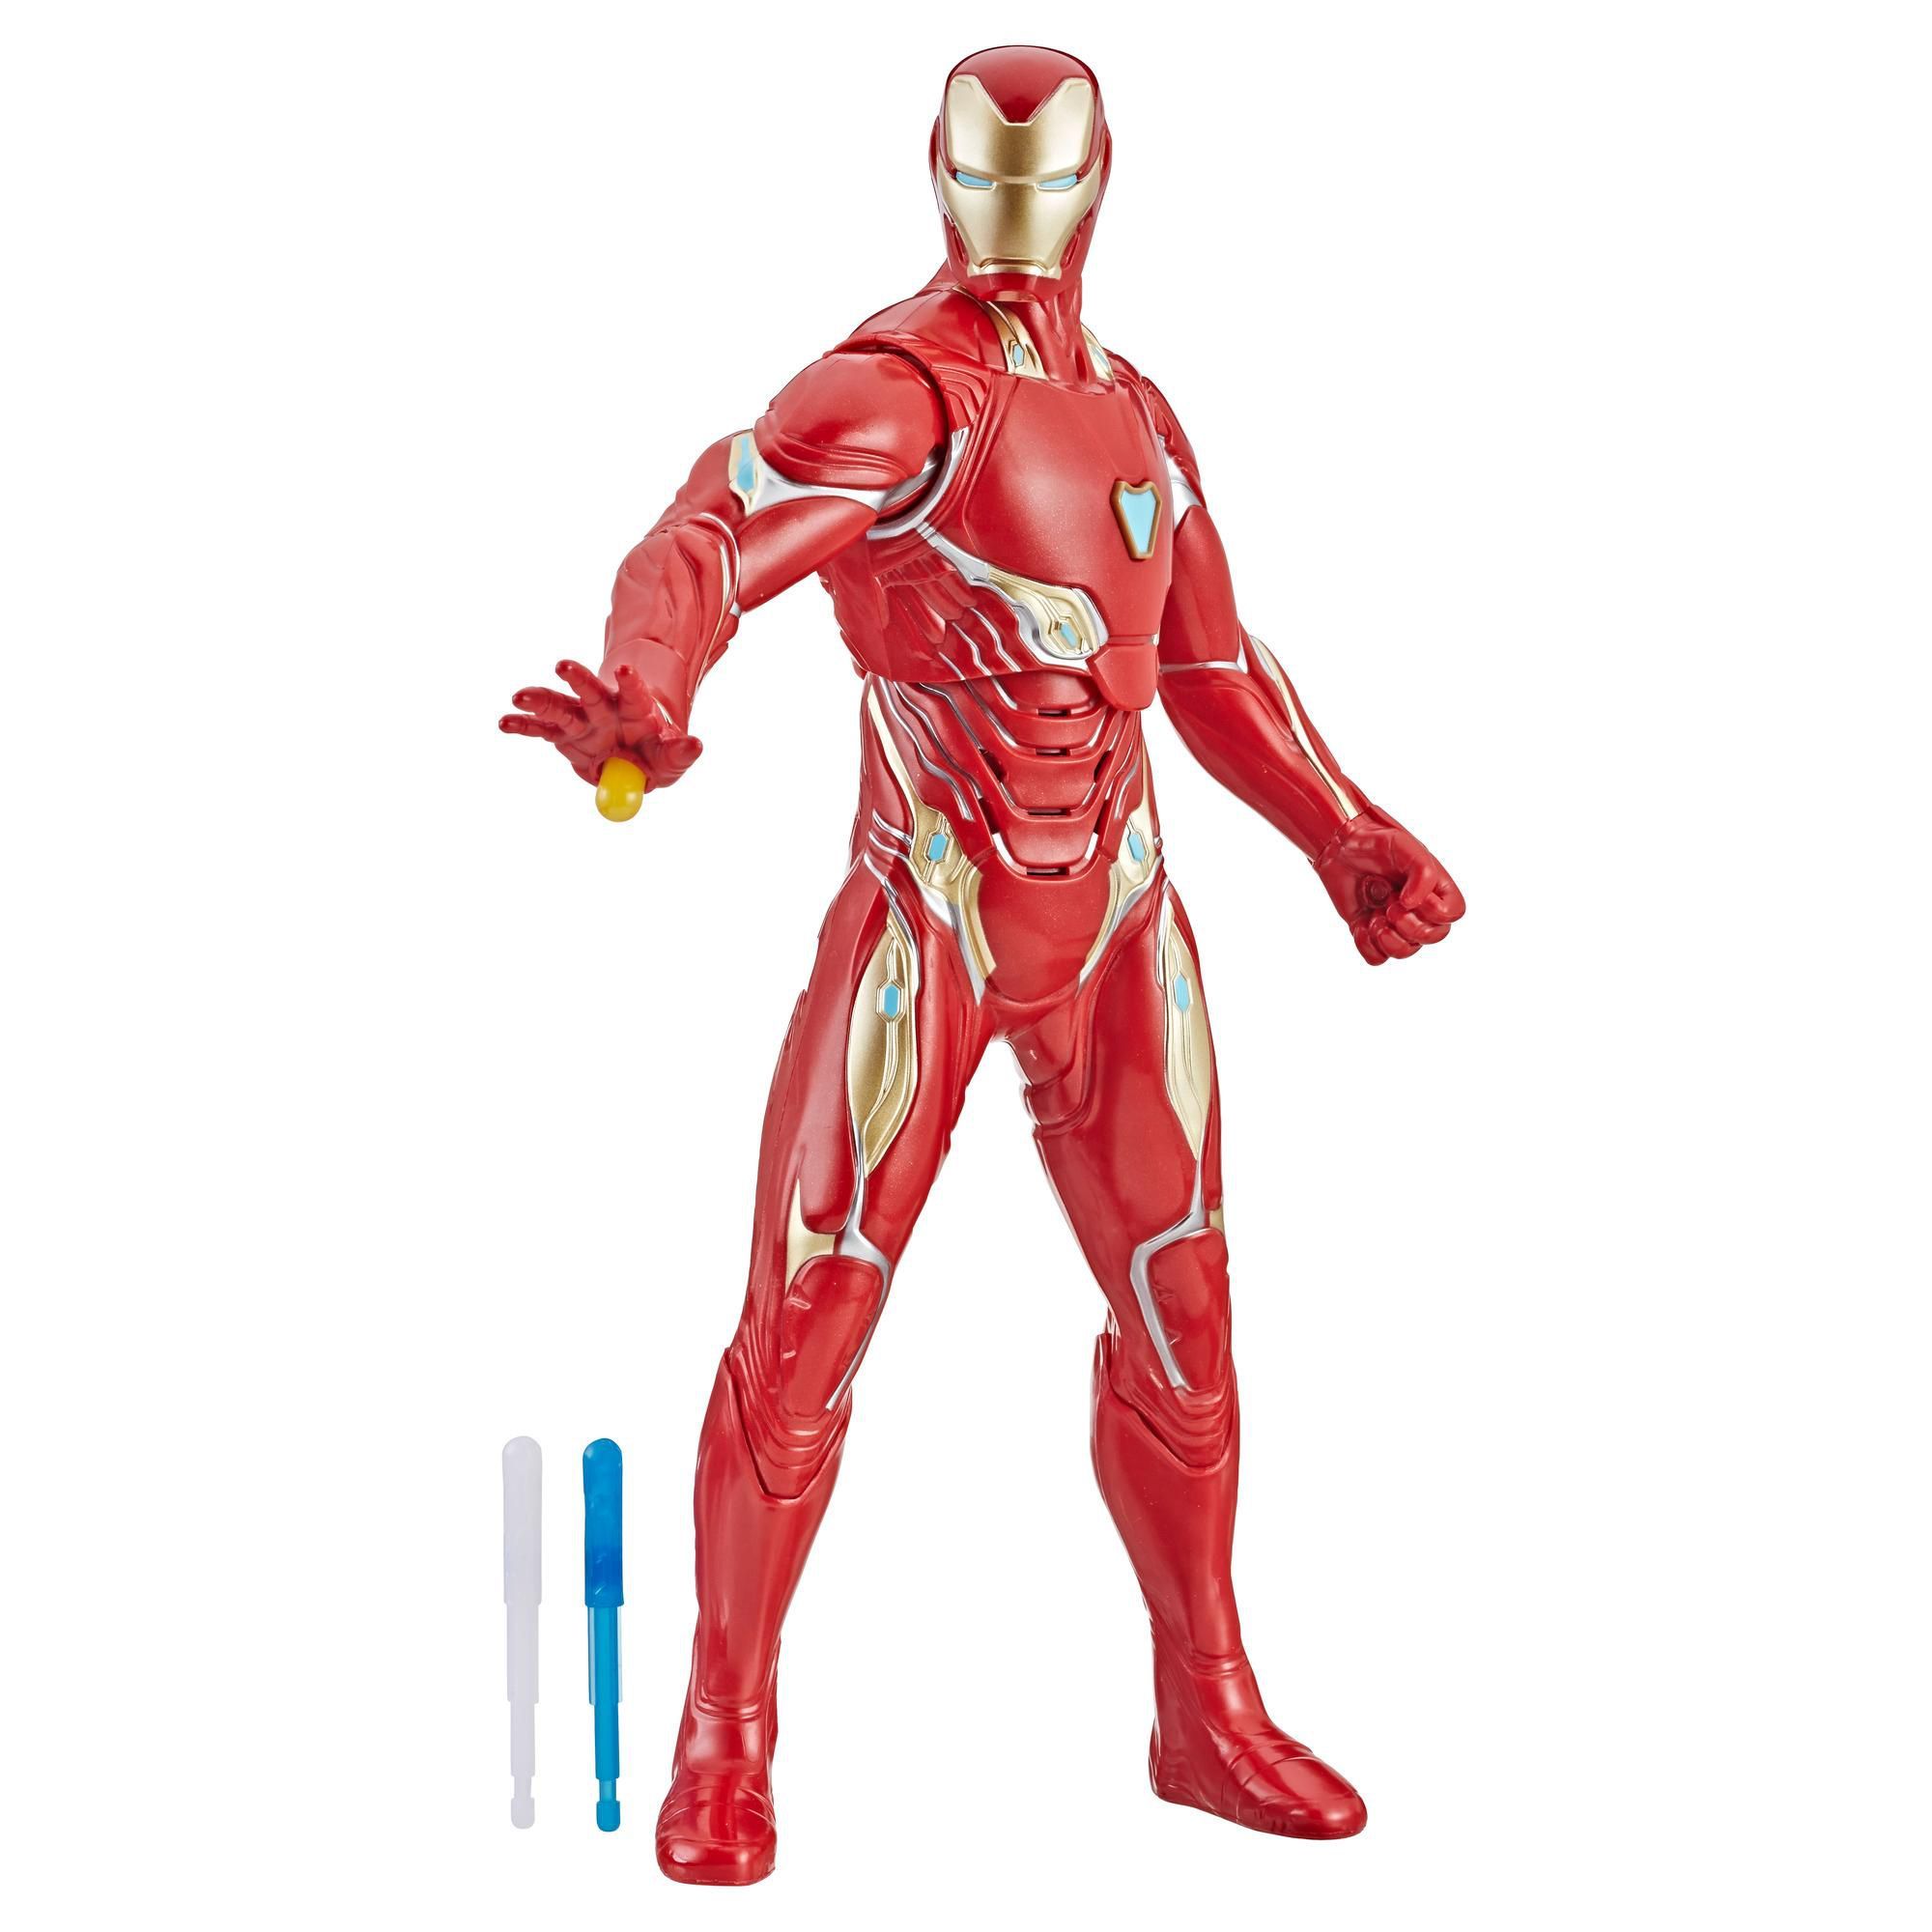 Boneco Repulsor Blast Homem de Ferro Eletrônico - Hasbro - E4929